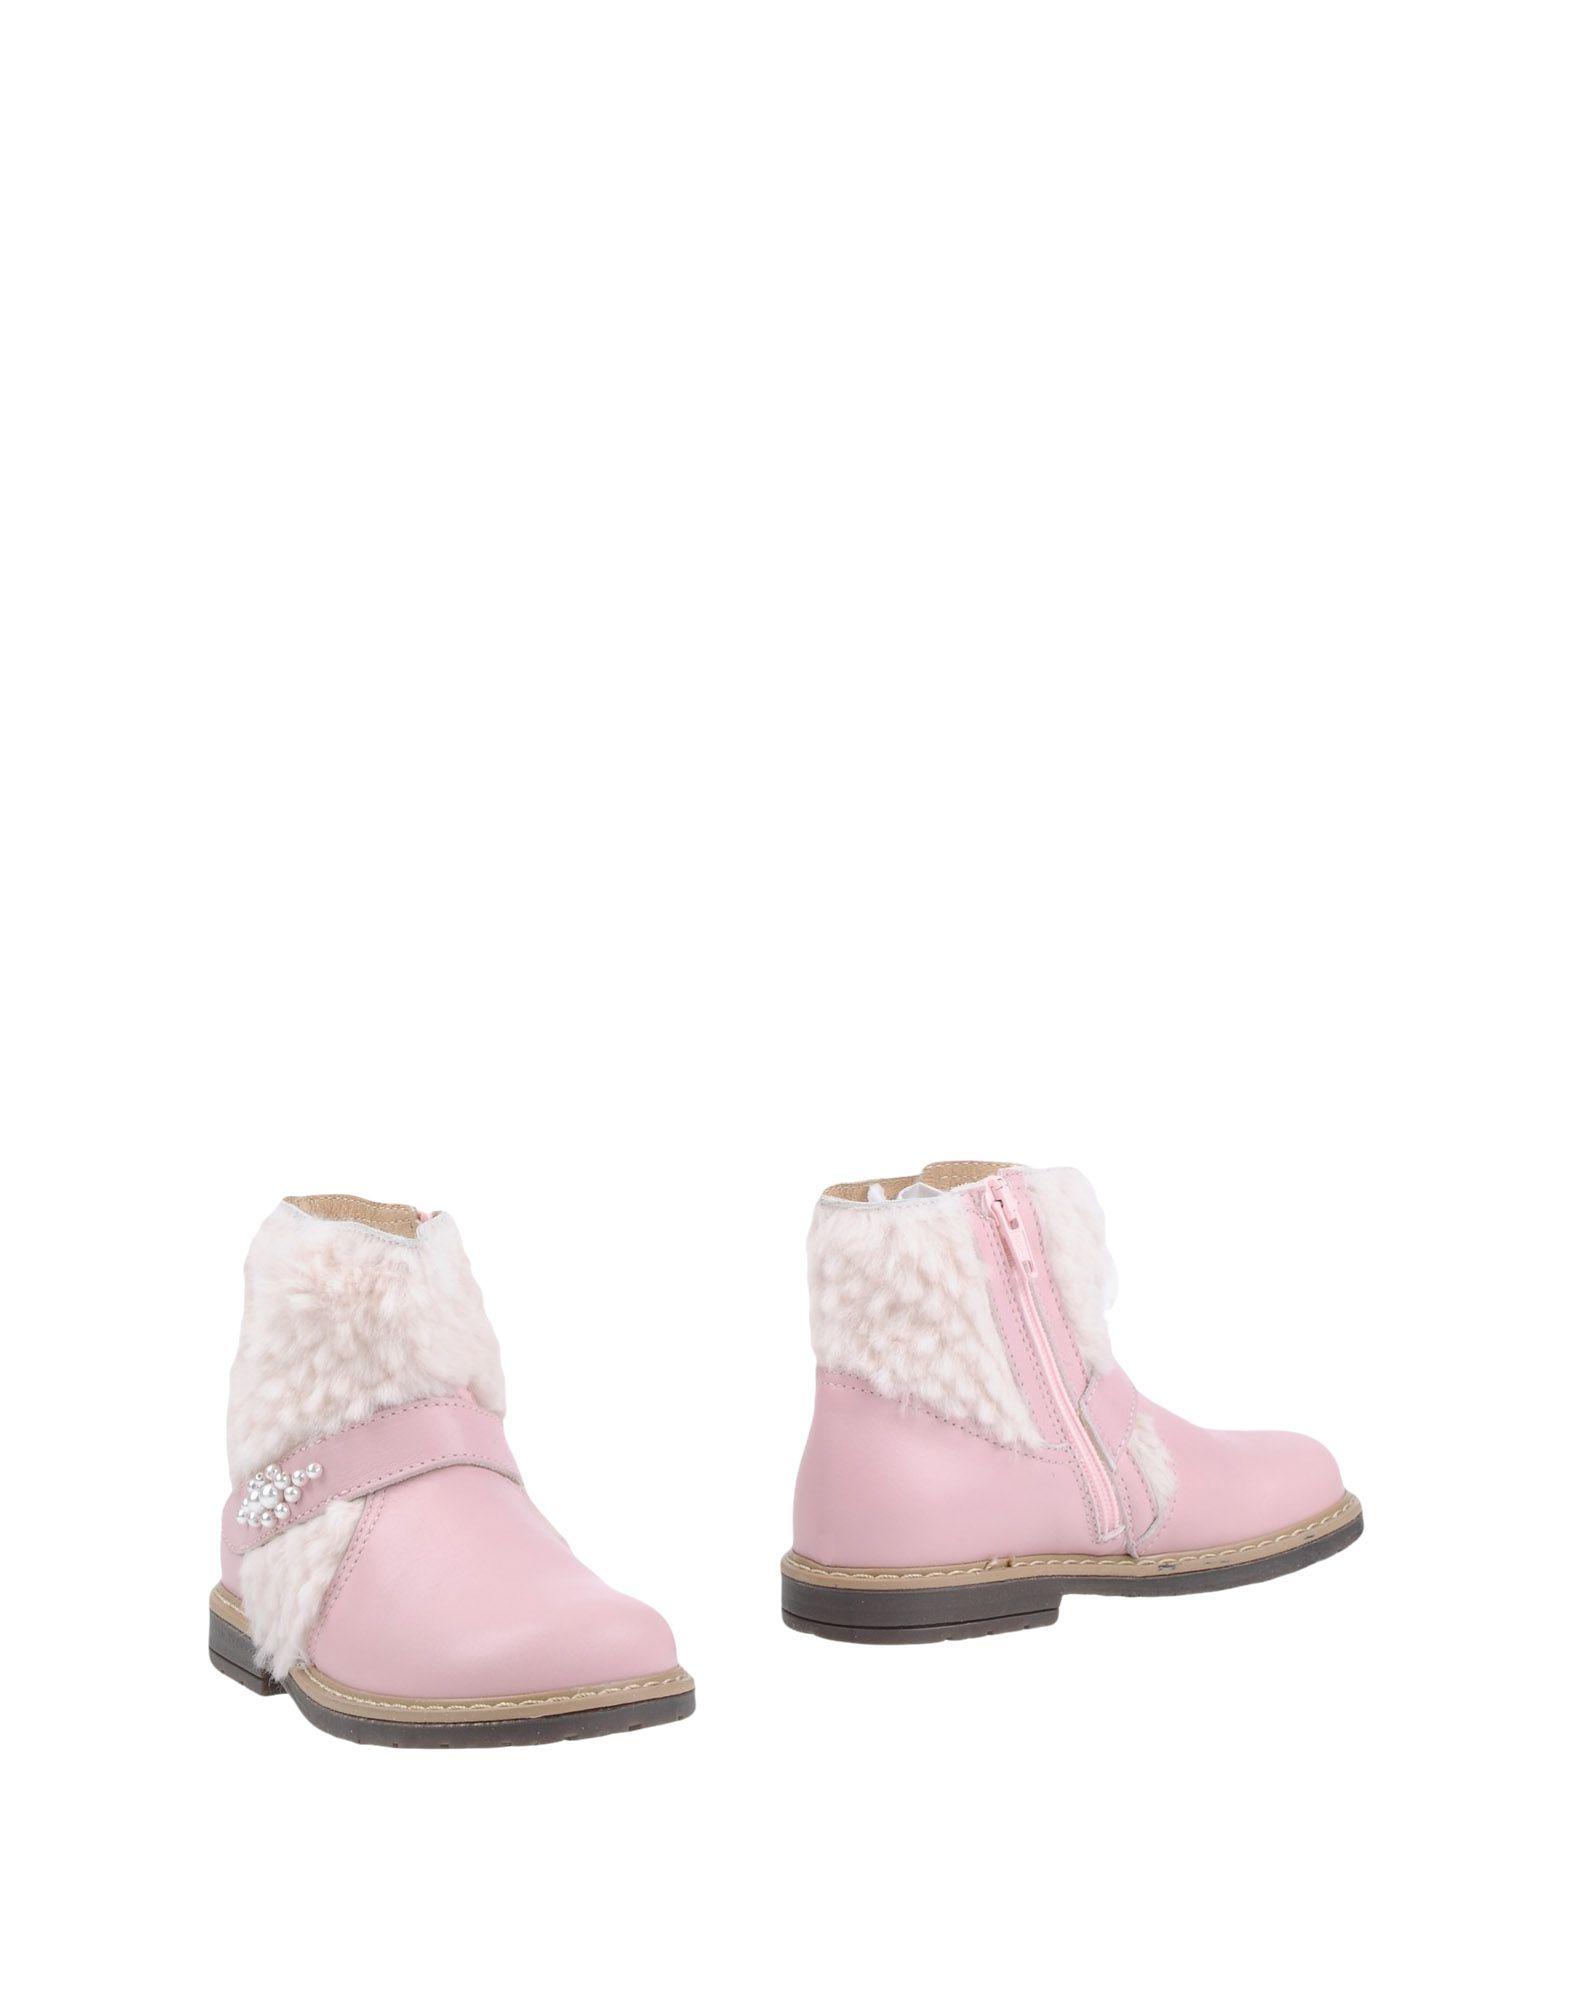 MISS BLUMARINE Полусапоги и высокие ботинки miss blumarine baby 397995